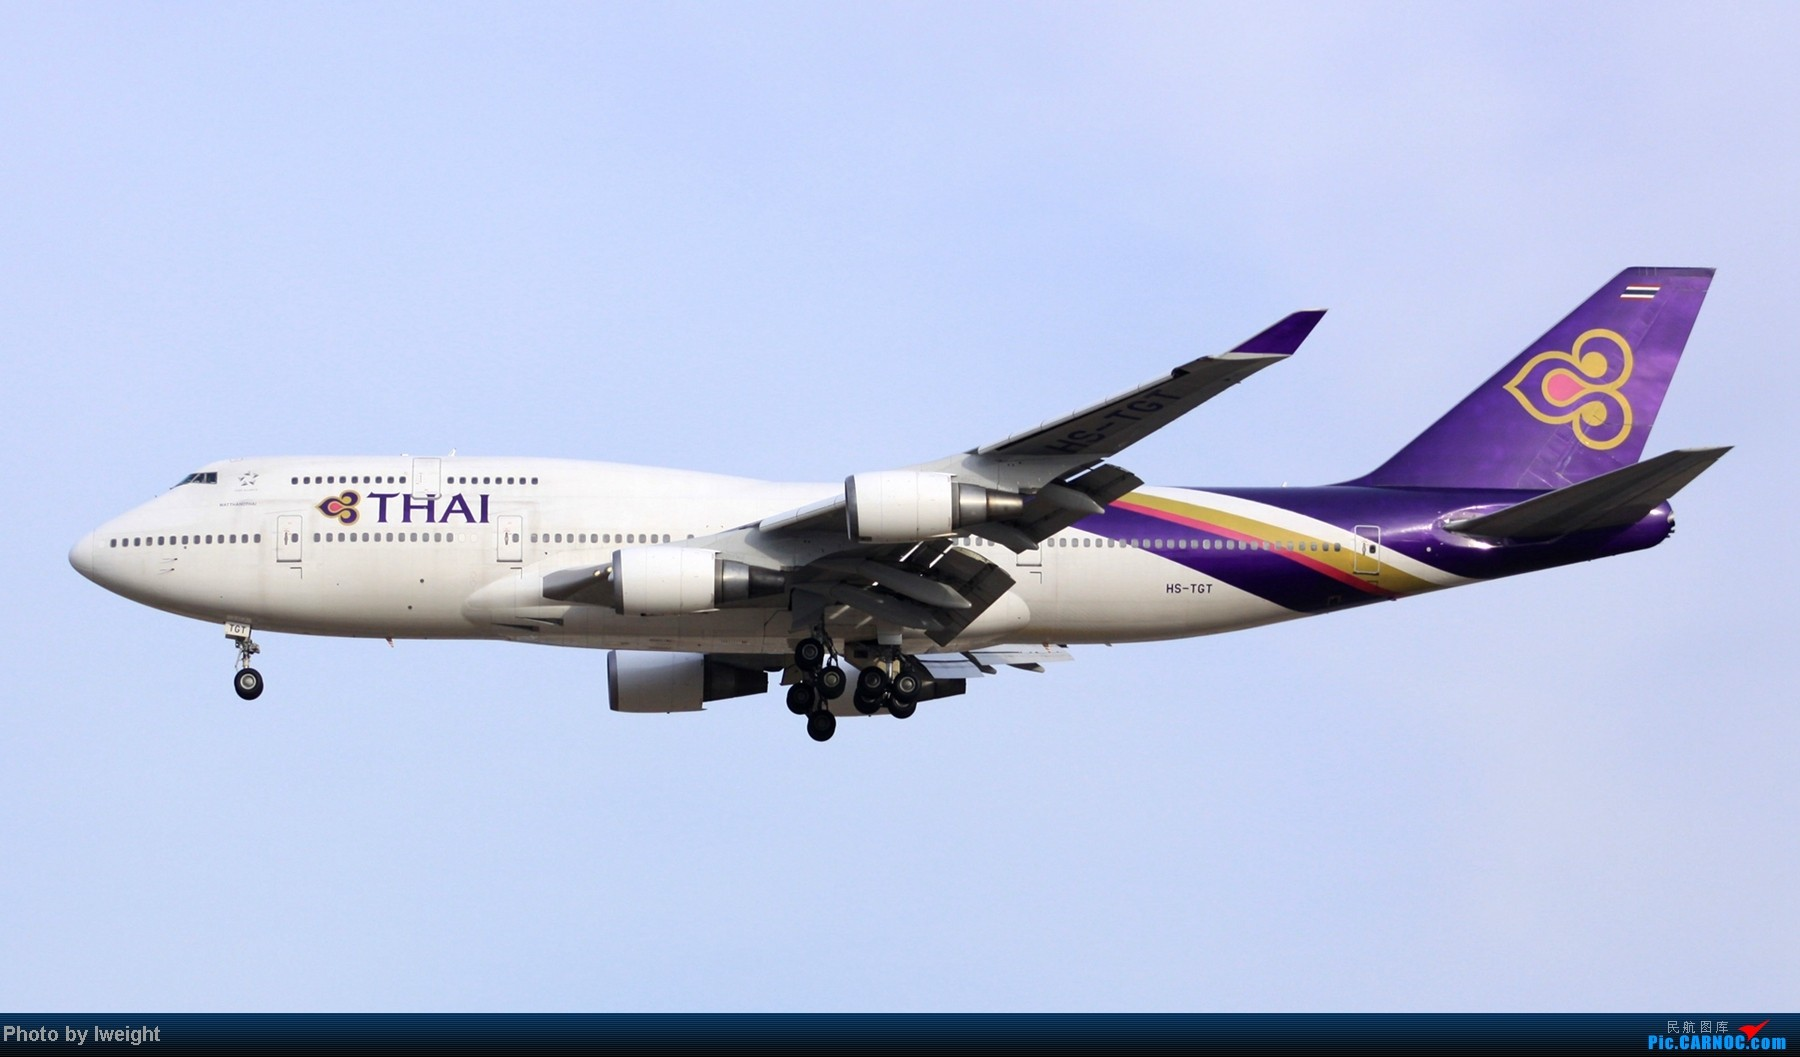 Re:[原创]春节期间首都机场拍机汇报 BOEING 747-400 HS-TGT 中国北京首都机场